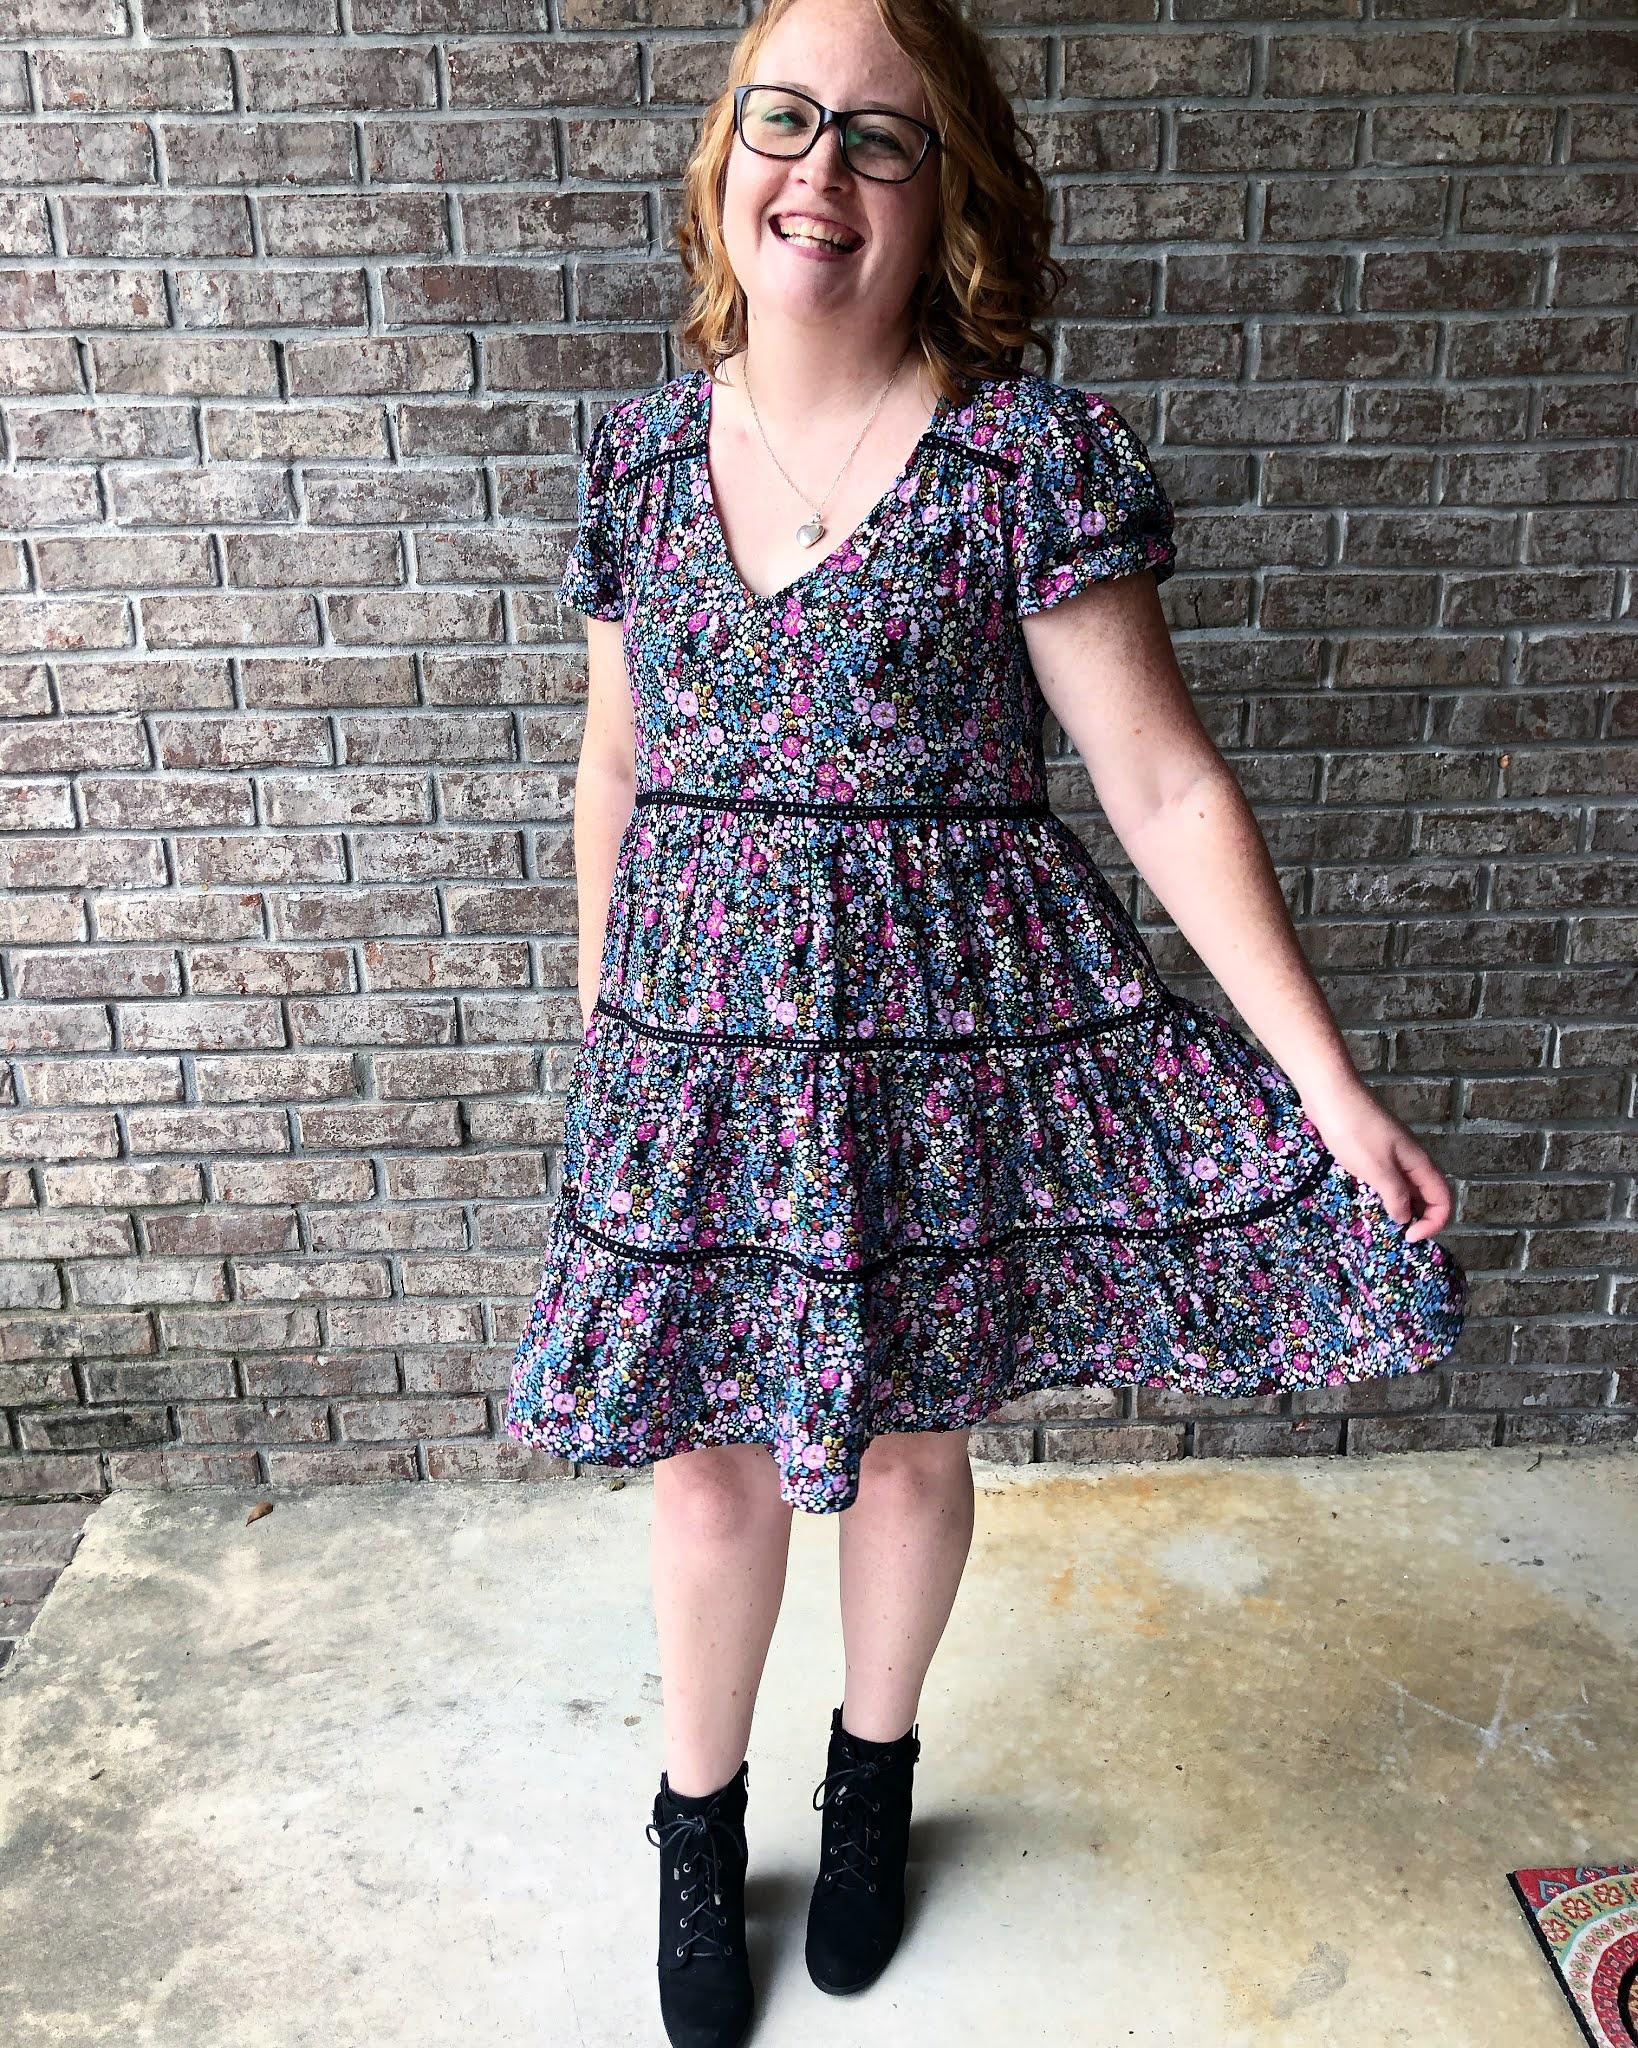 purple-flower-dress-black-lace-up-booties